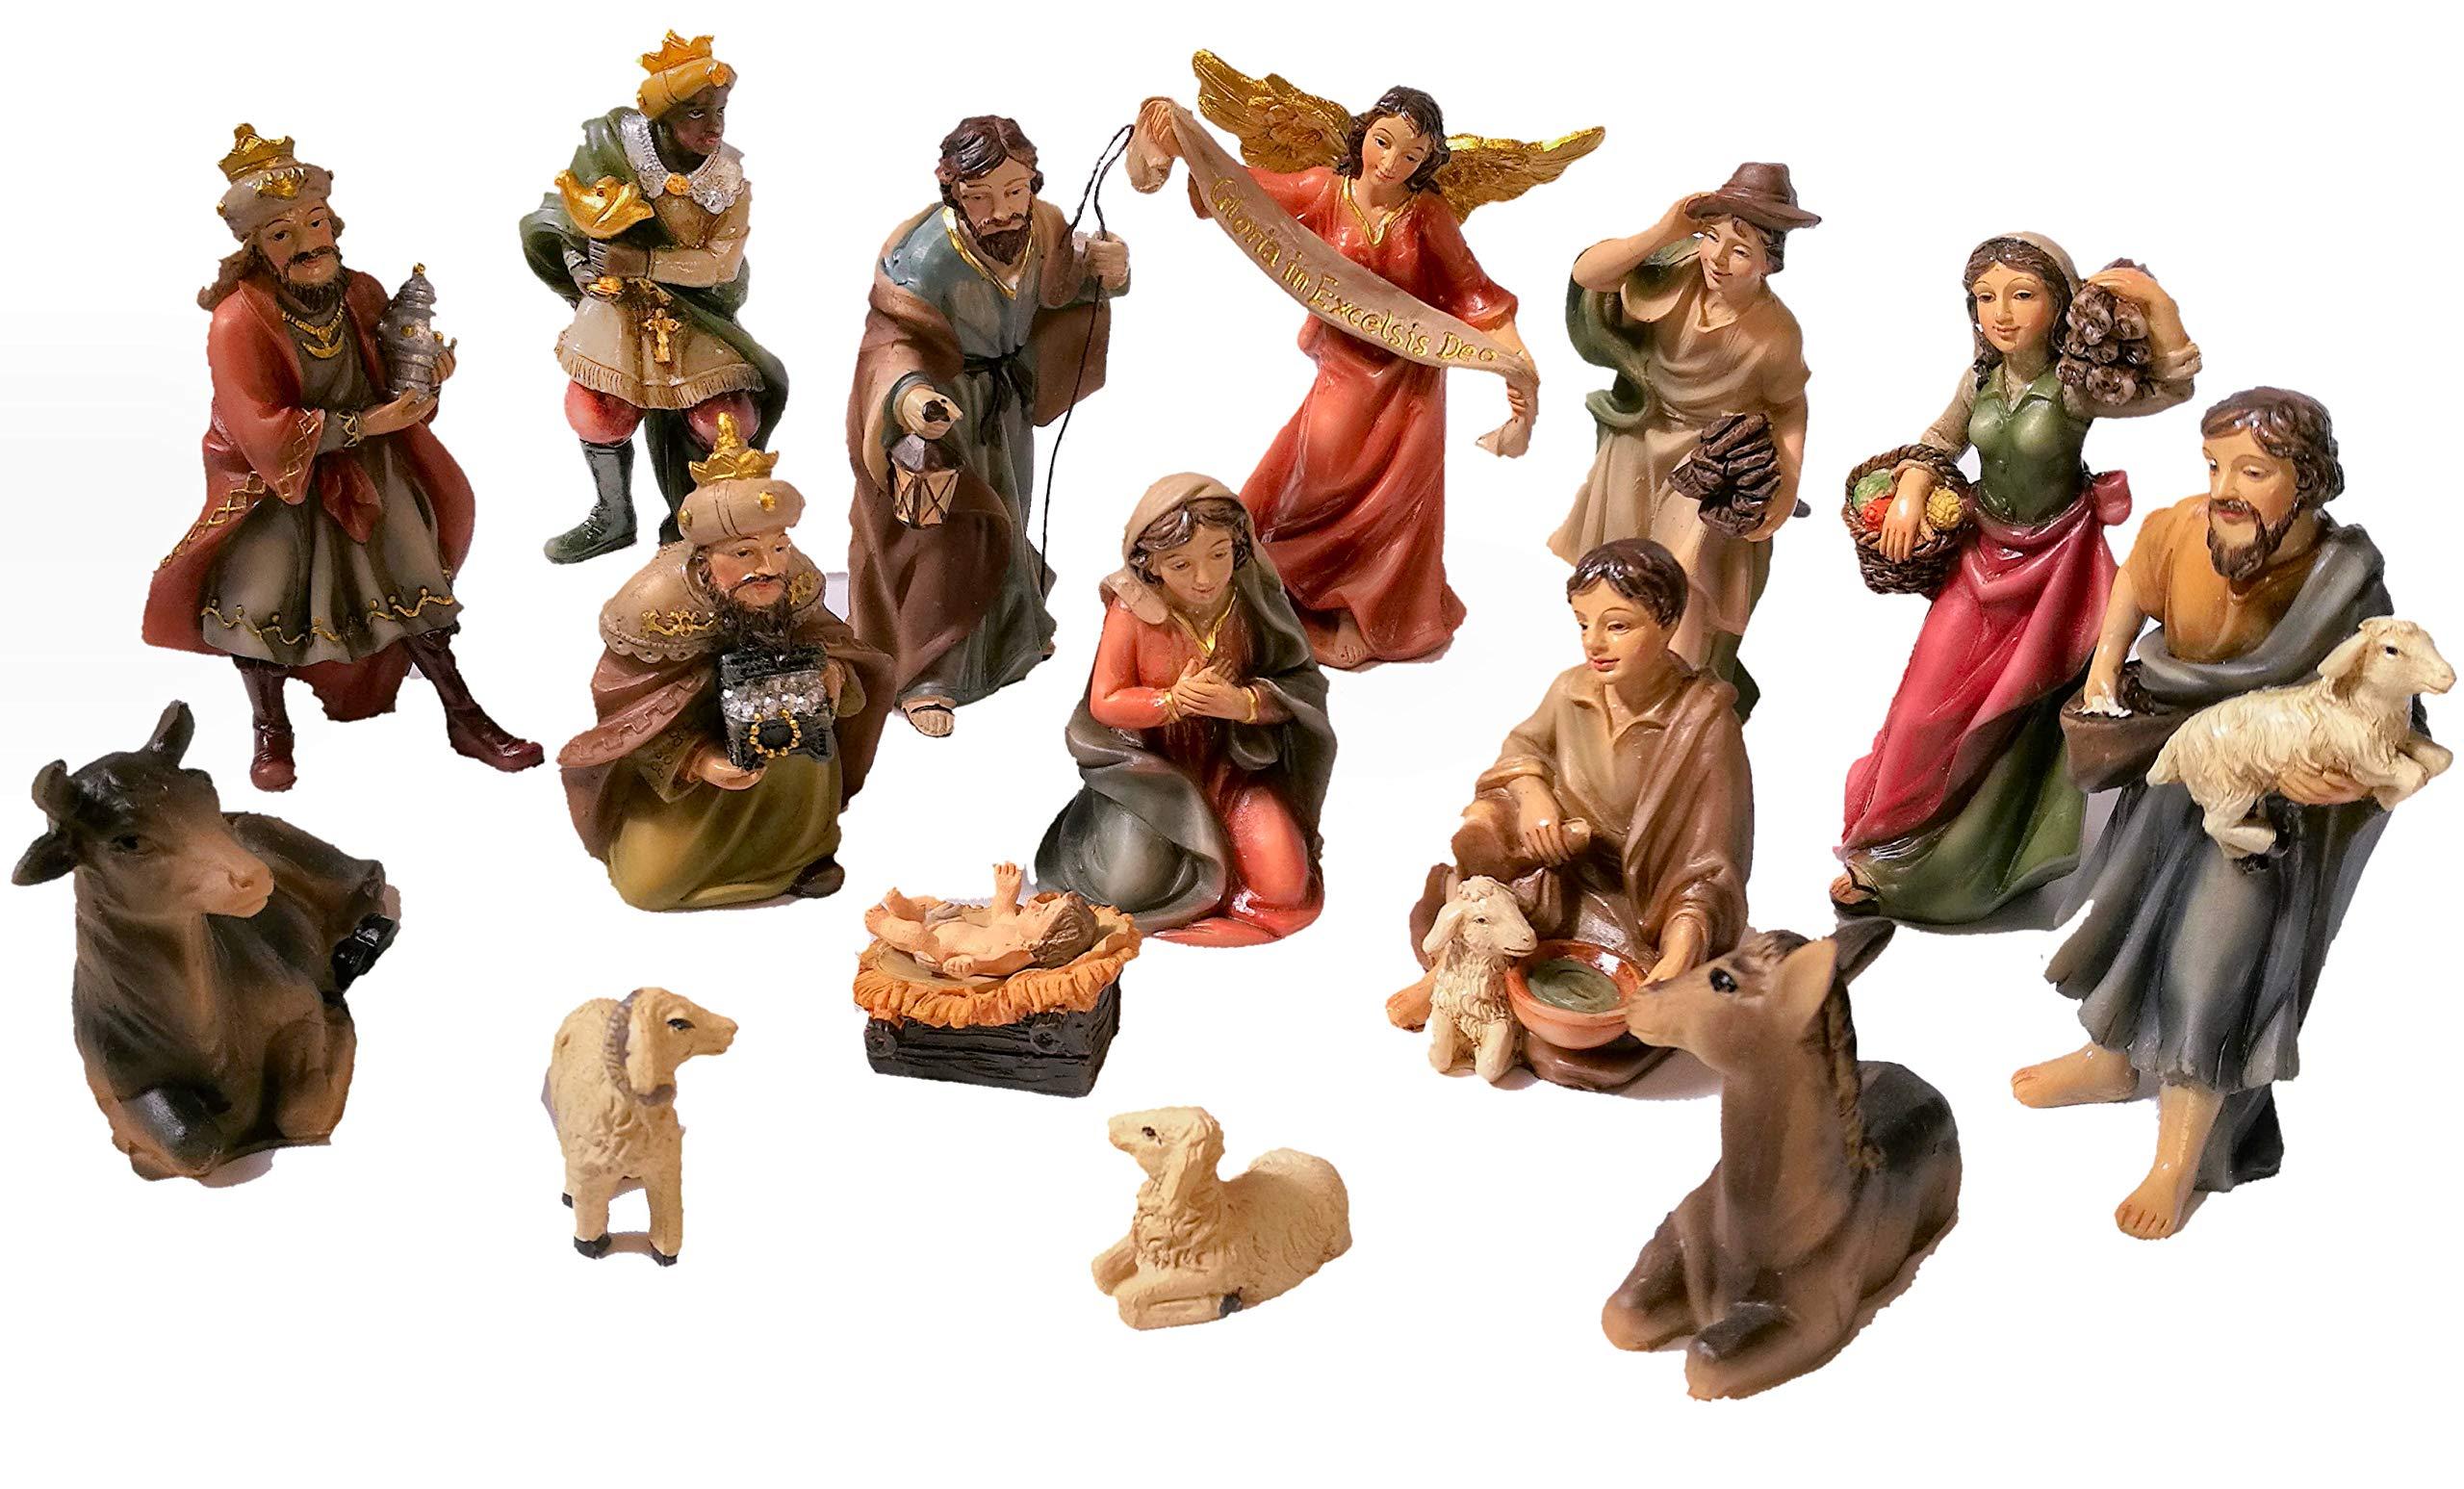 Faithful Treasure 15-Piece Nativity Figurine Set. Hand-Painted Christmas Nativity Scene, 4'' Tall